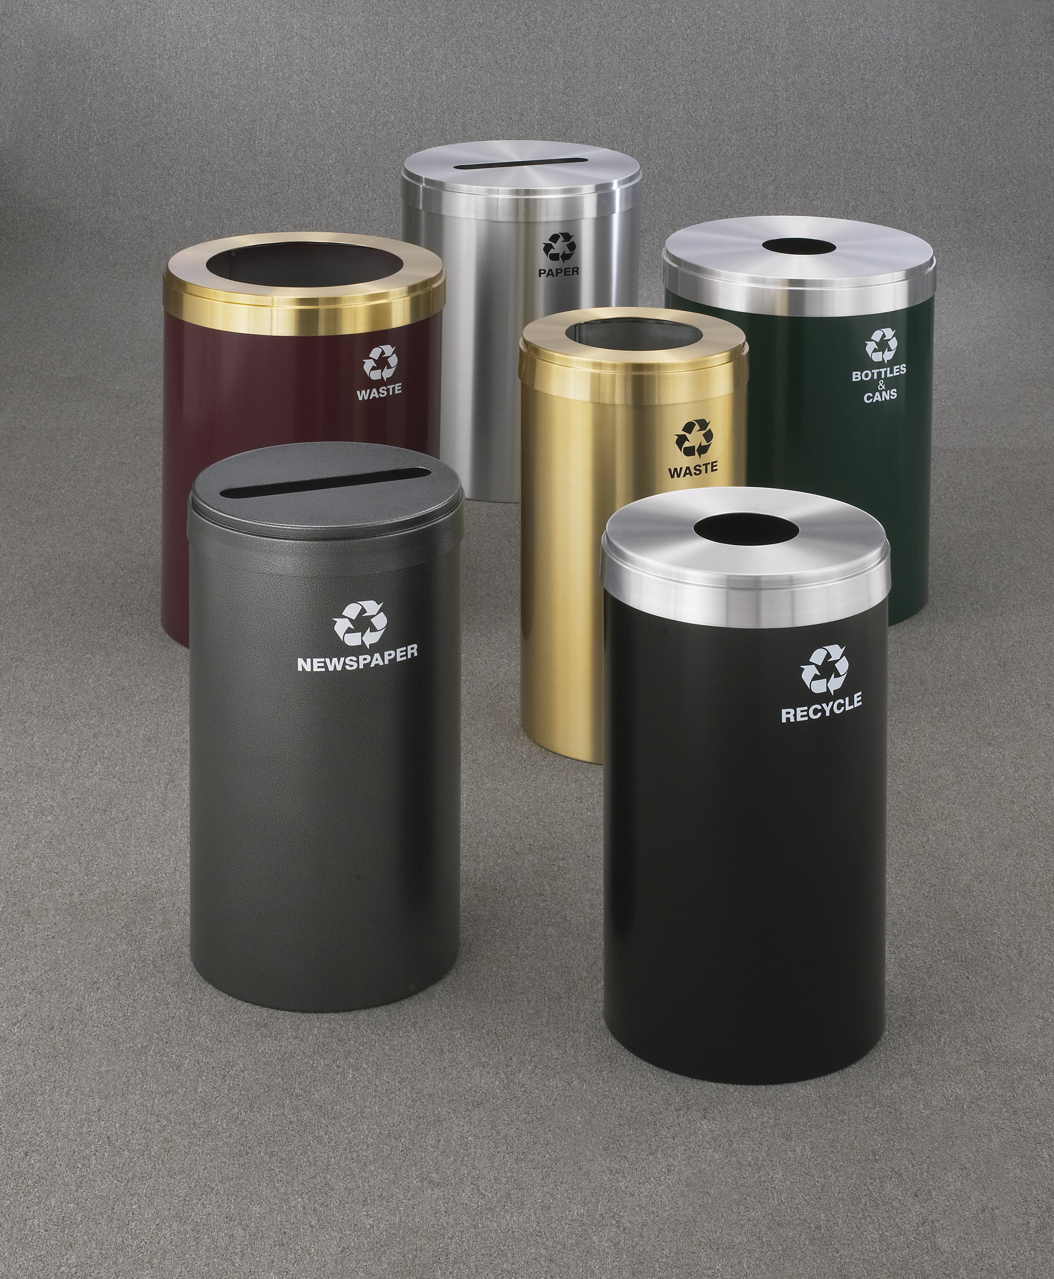 recycprosingl-modgrp-97665.1450464391.1280.1280.jpg